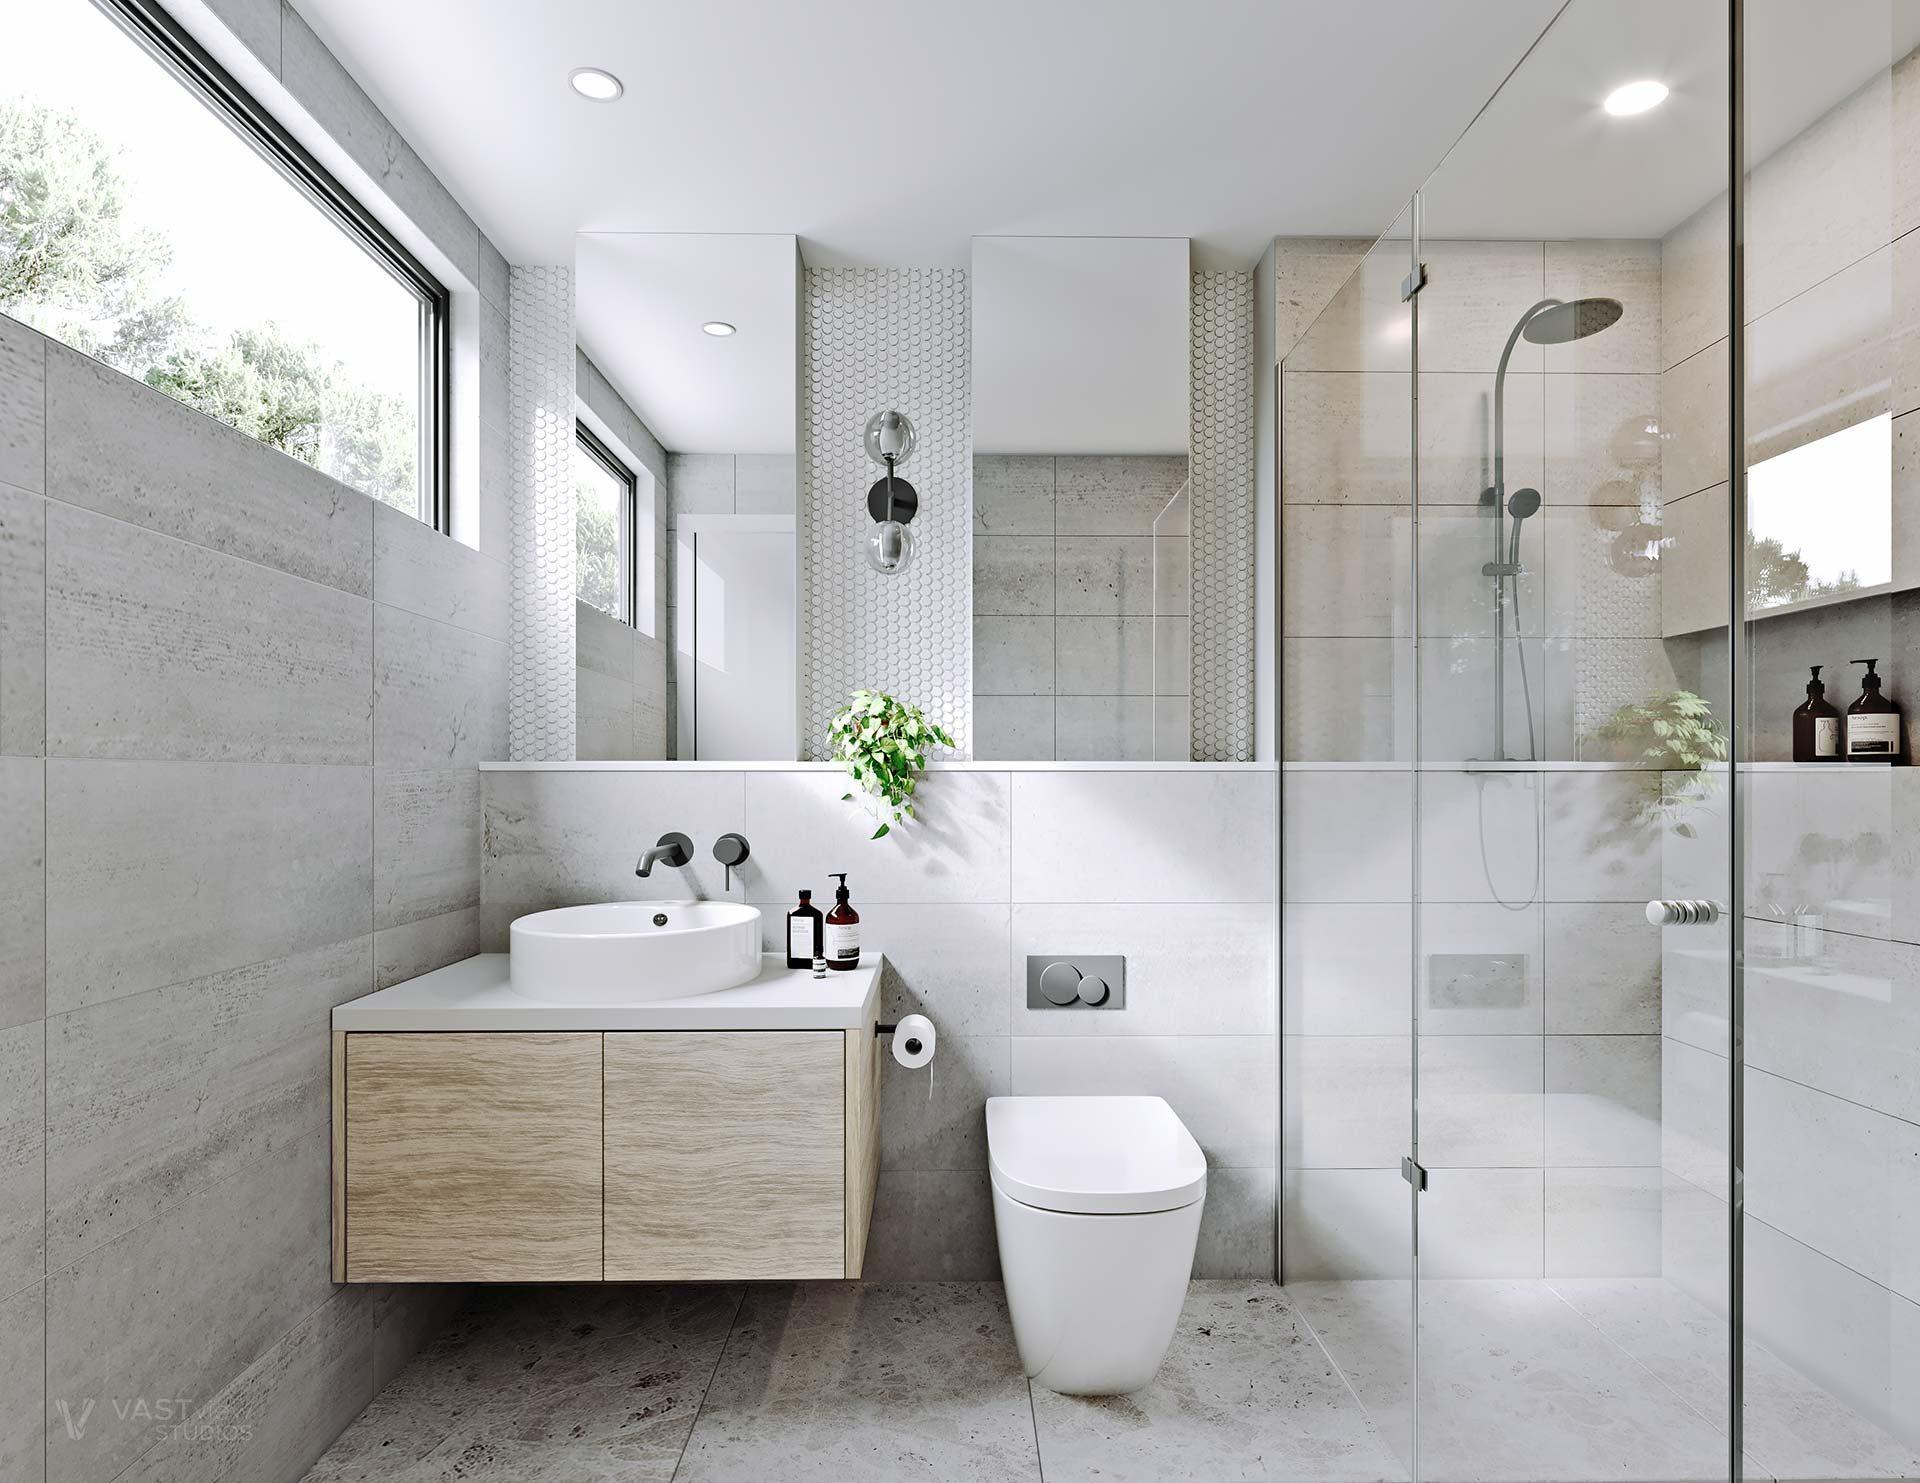 QueenSt_Bathroom_FinalRender_v1